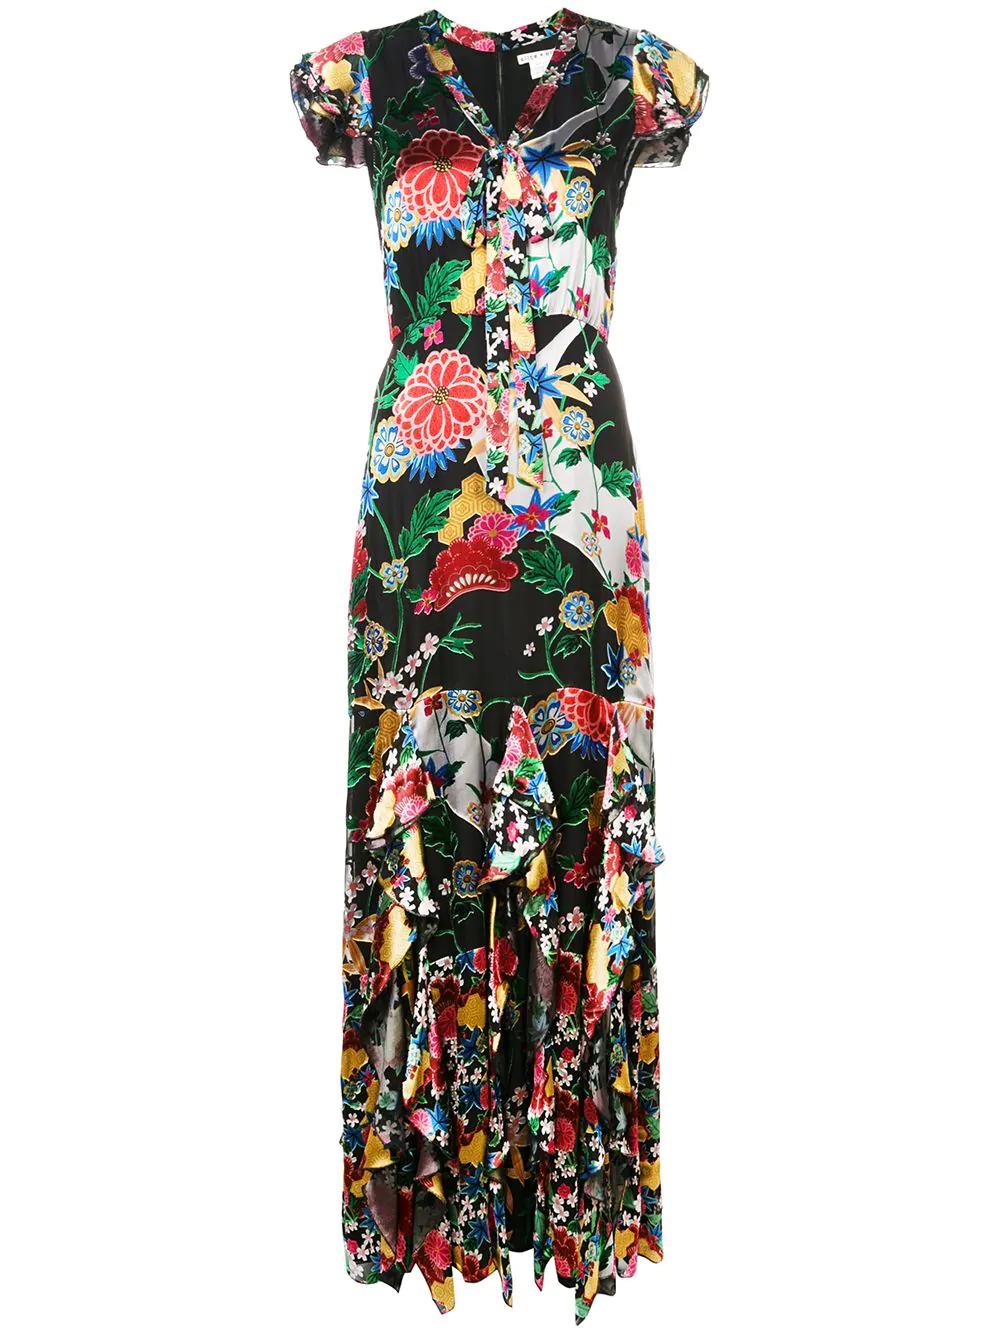 189b4cd844f0 Alice And Olivia Laurette Ruffled Floral-Print Satin Maxi Dress In Black